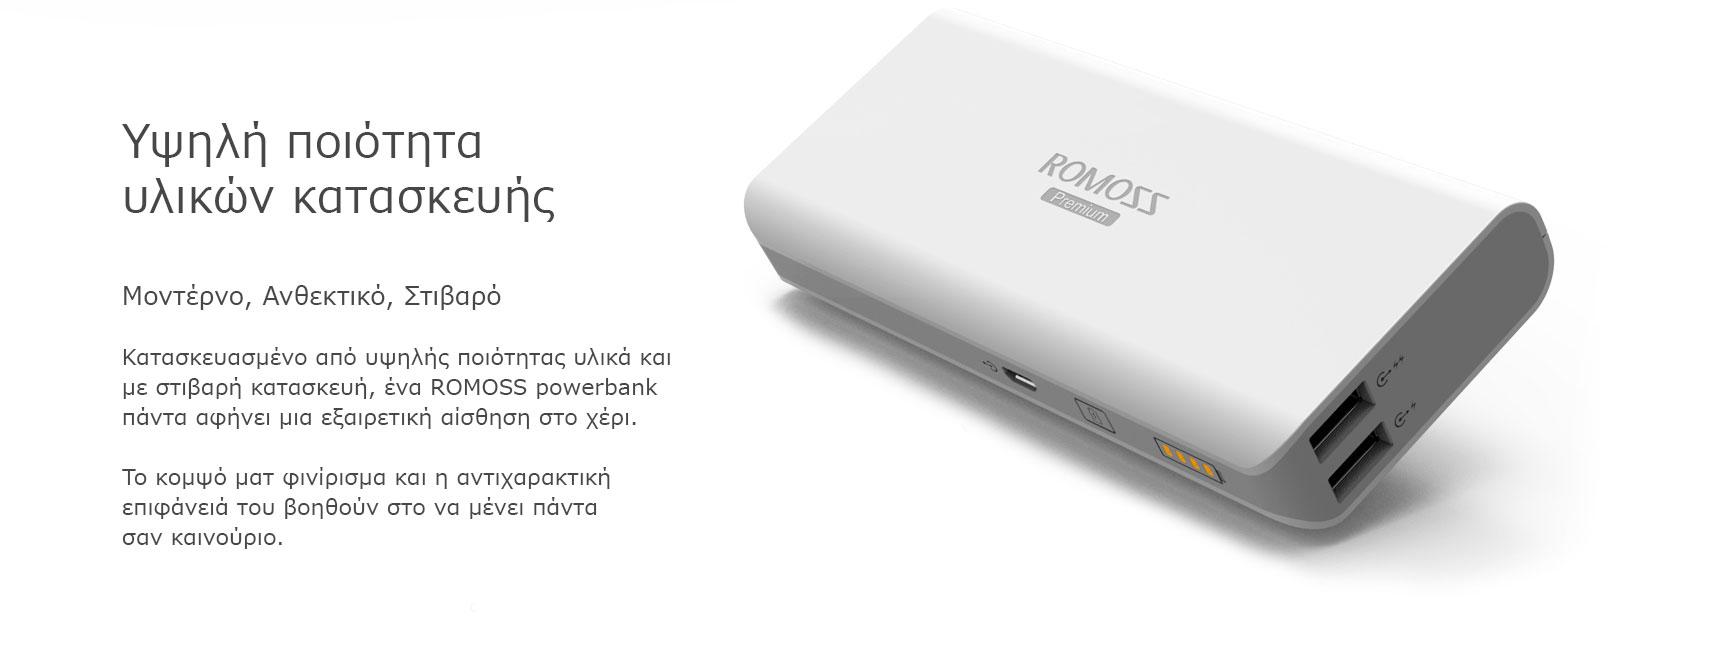 romoss-powerbanks-texnologia6